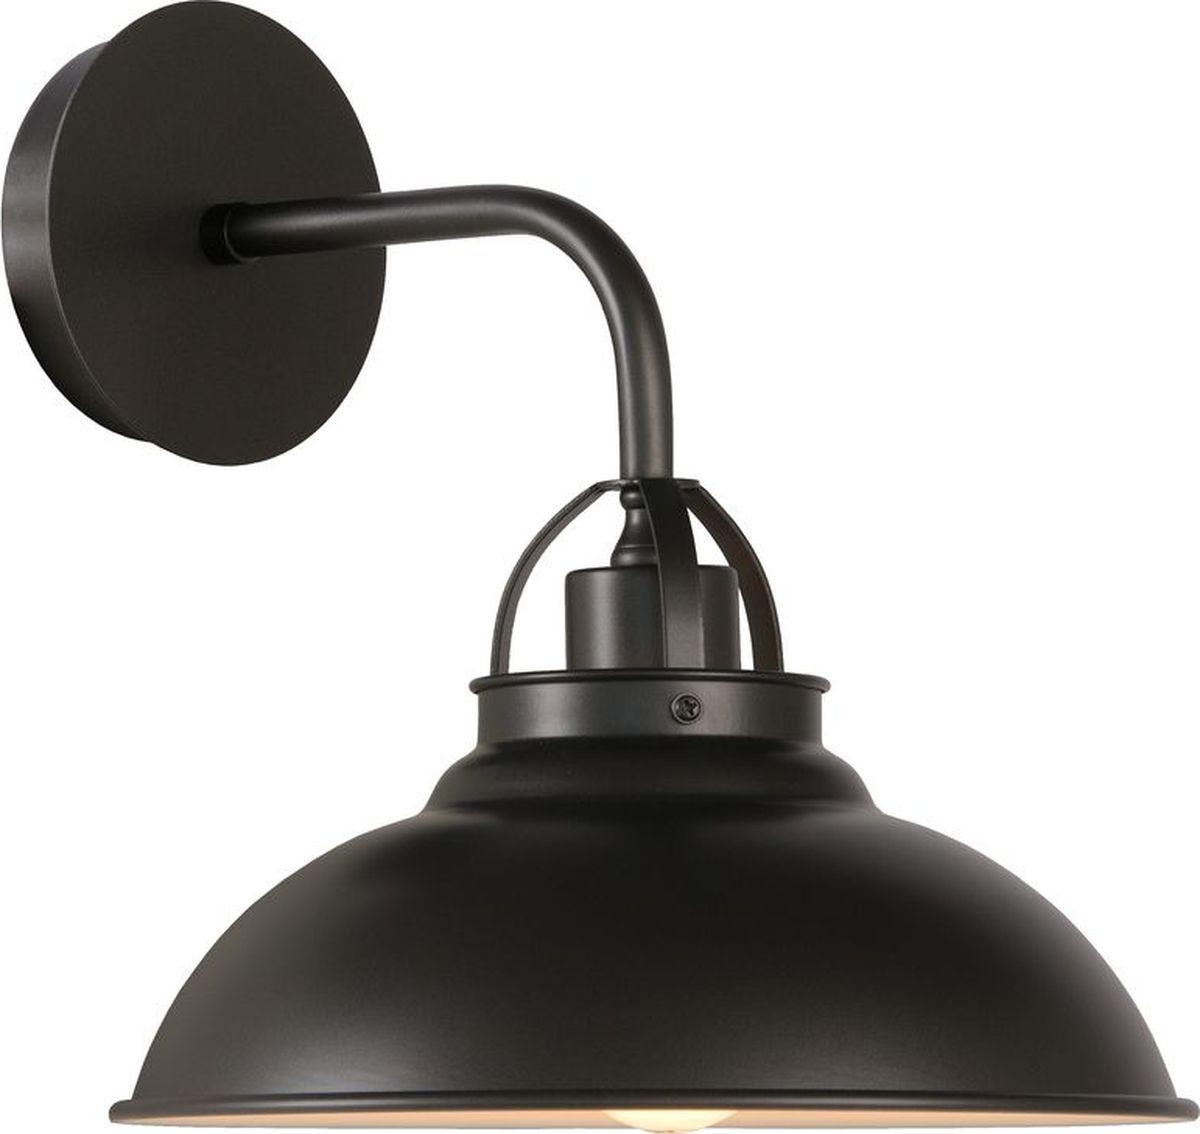 Бра Lucide Hamois, цвет: черный, E27, 40 Вт. 31248/01/1531248/01/15